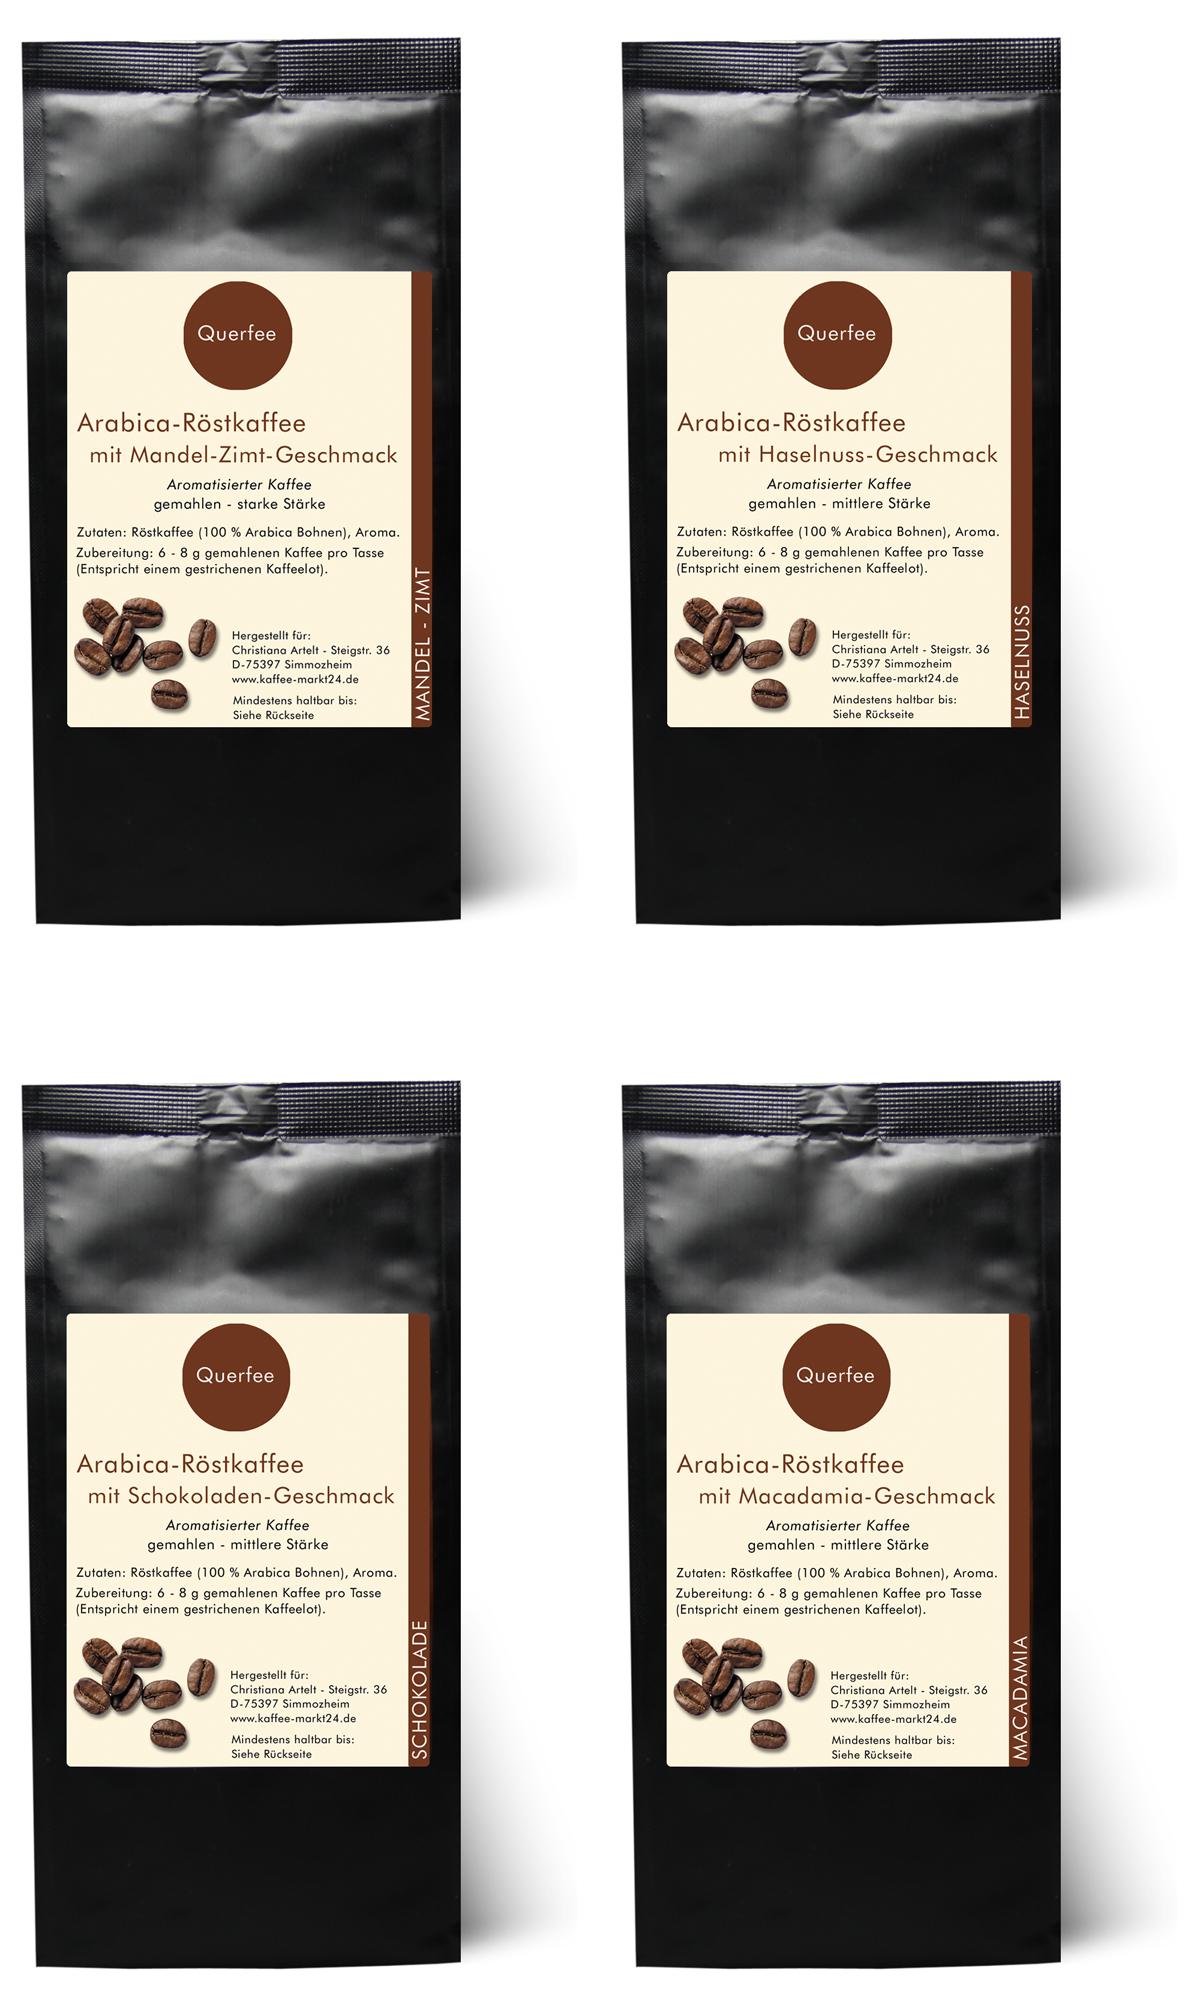 4 x Kaffee mit Geschmack Probierset - Mandel Zimt, Toffee, Schokolade, Macadamia - gemahlen - 4 x 75 g